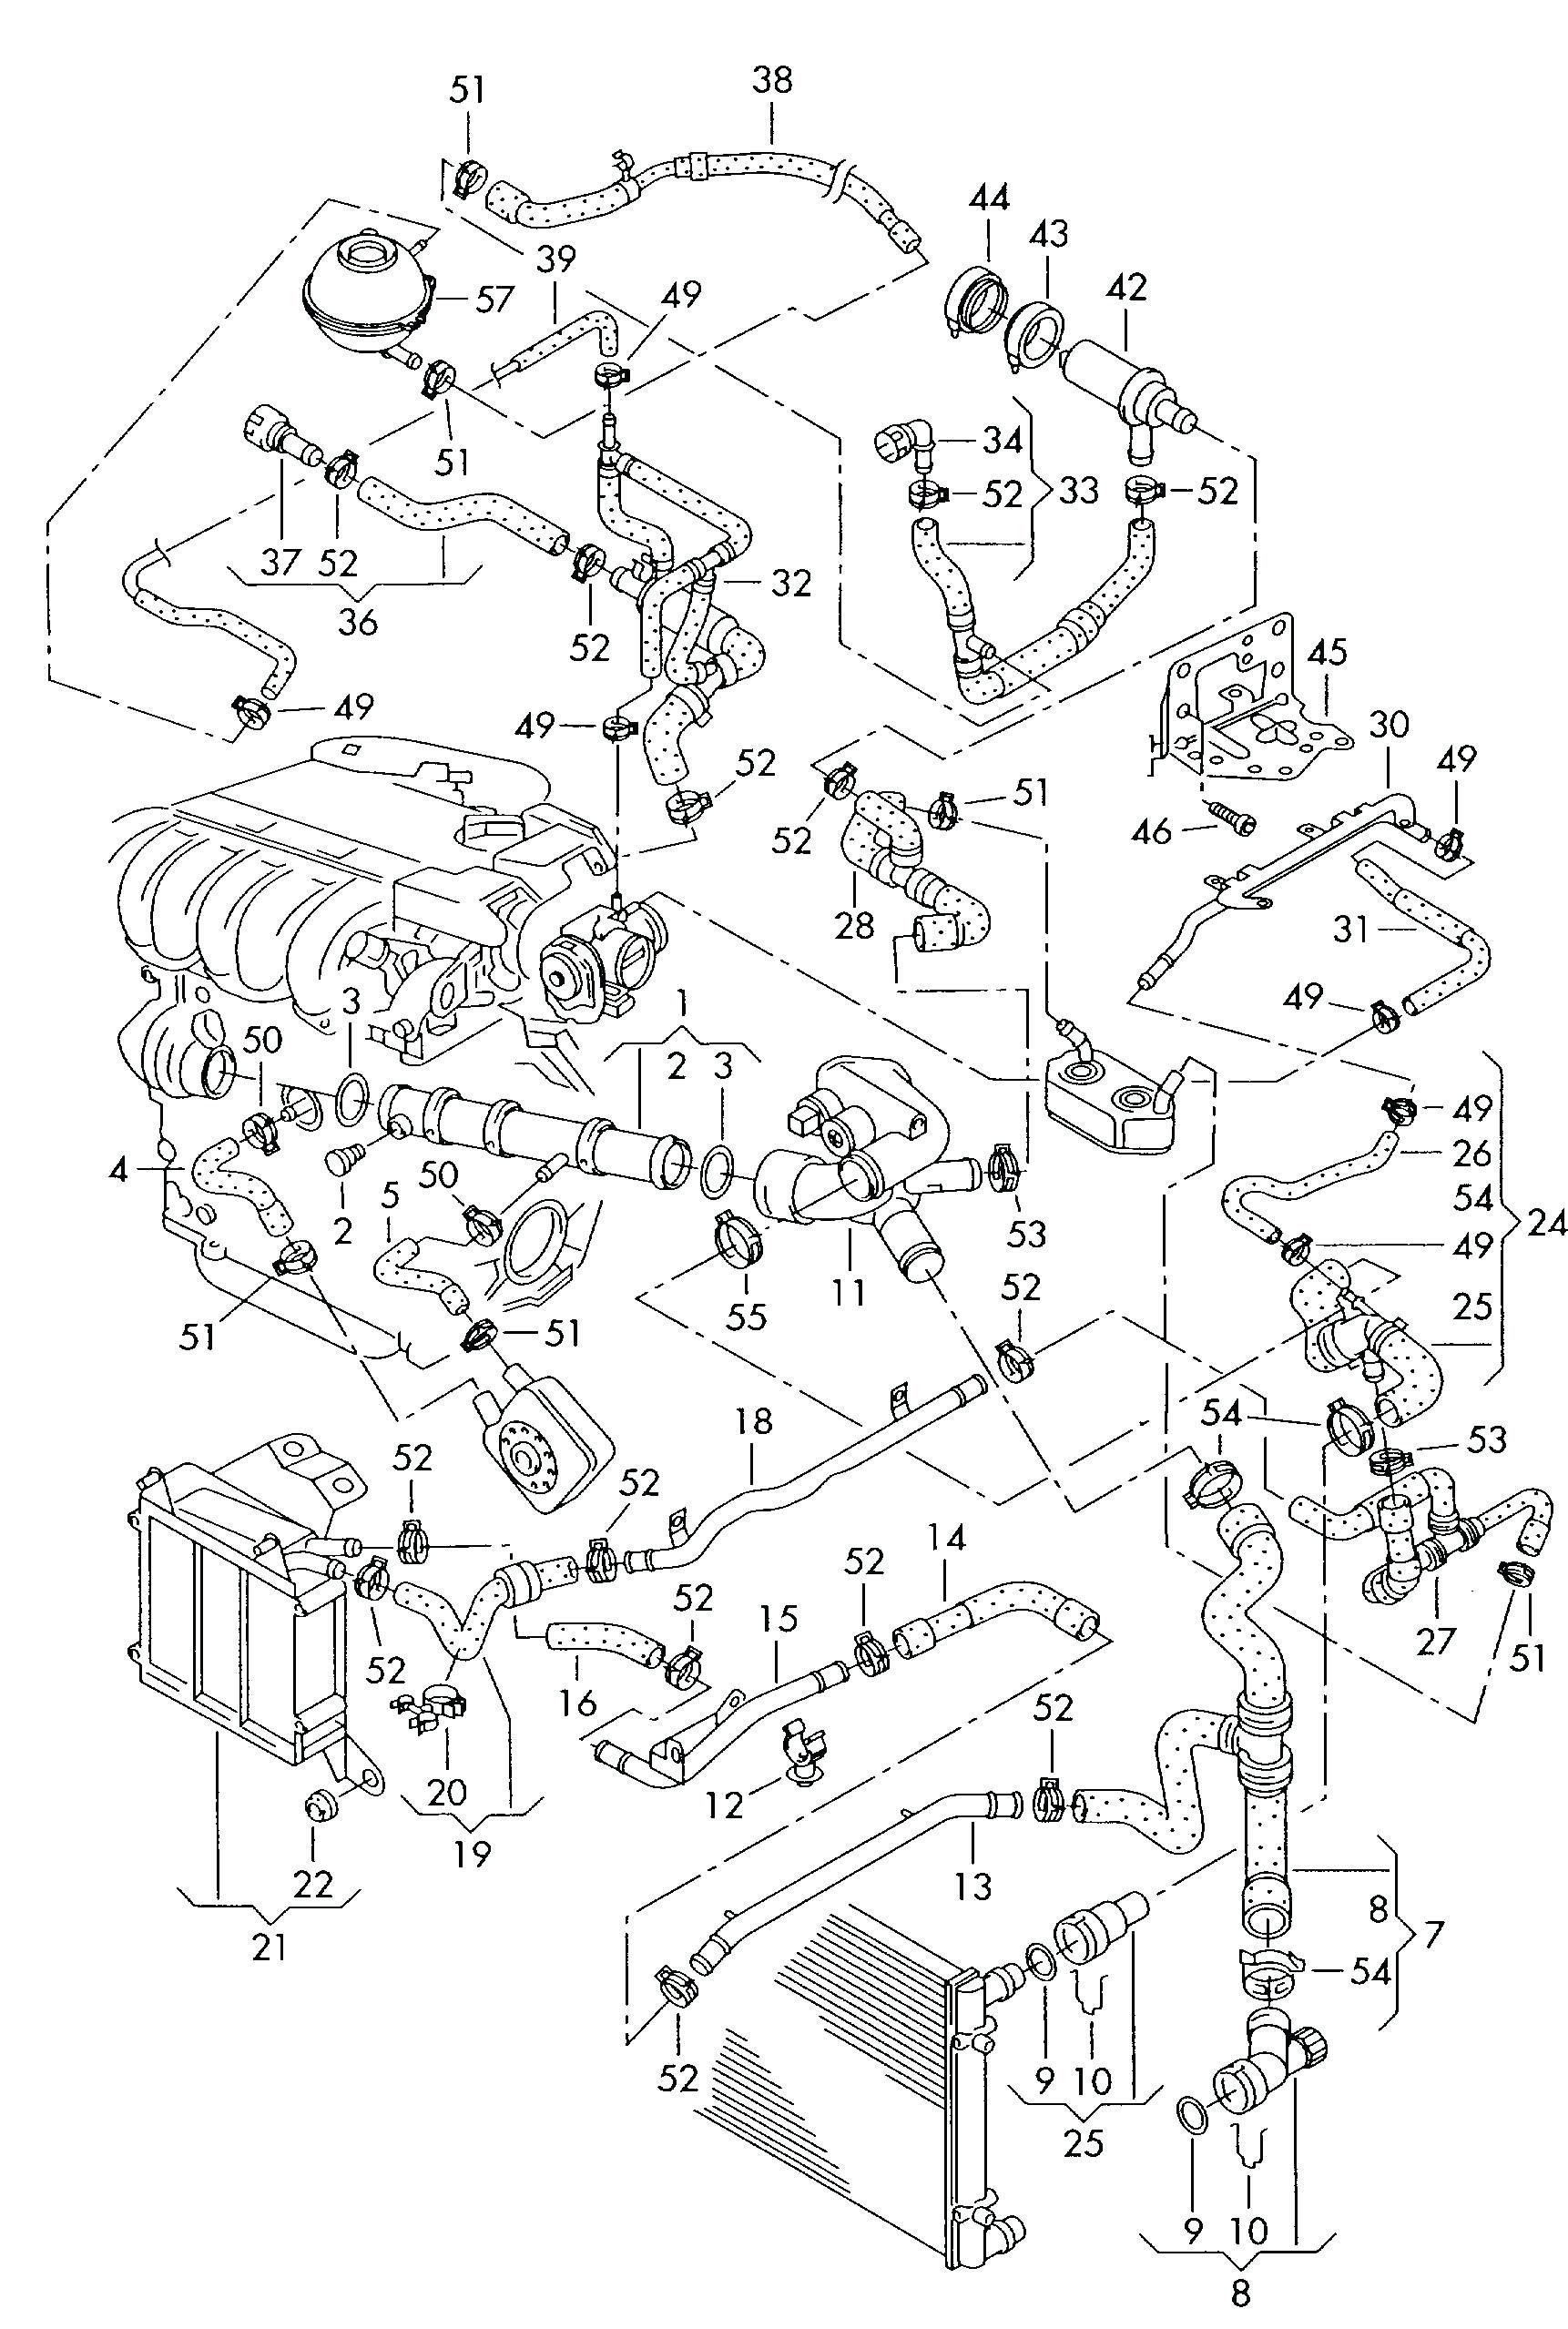 2008 Vw Jetta Fuse Box Diagram 2008 Volkswagen Jetta Engine Diagram Wiring Diagram Var